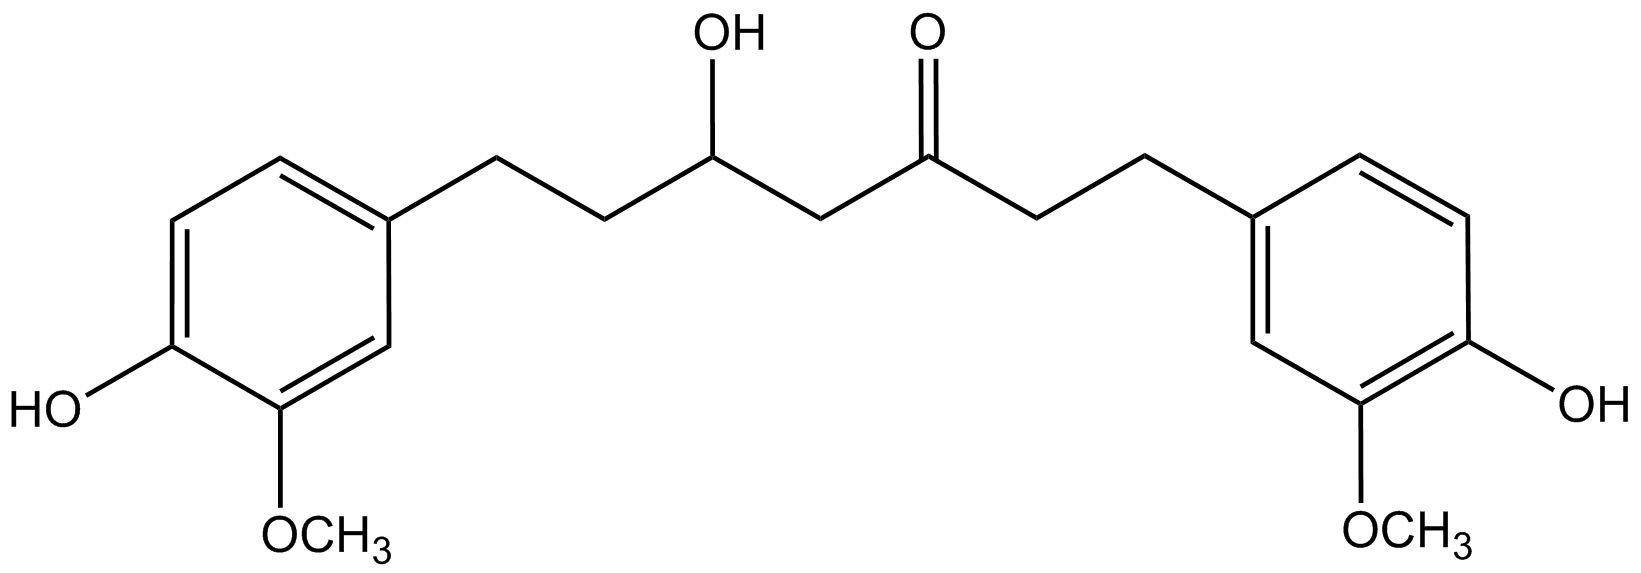 Hexahydrocurcumin phyproof® Referenzsubstanz   PhytoLab